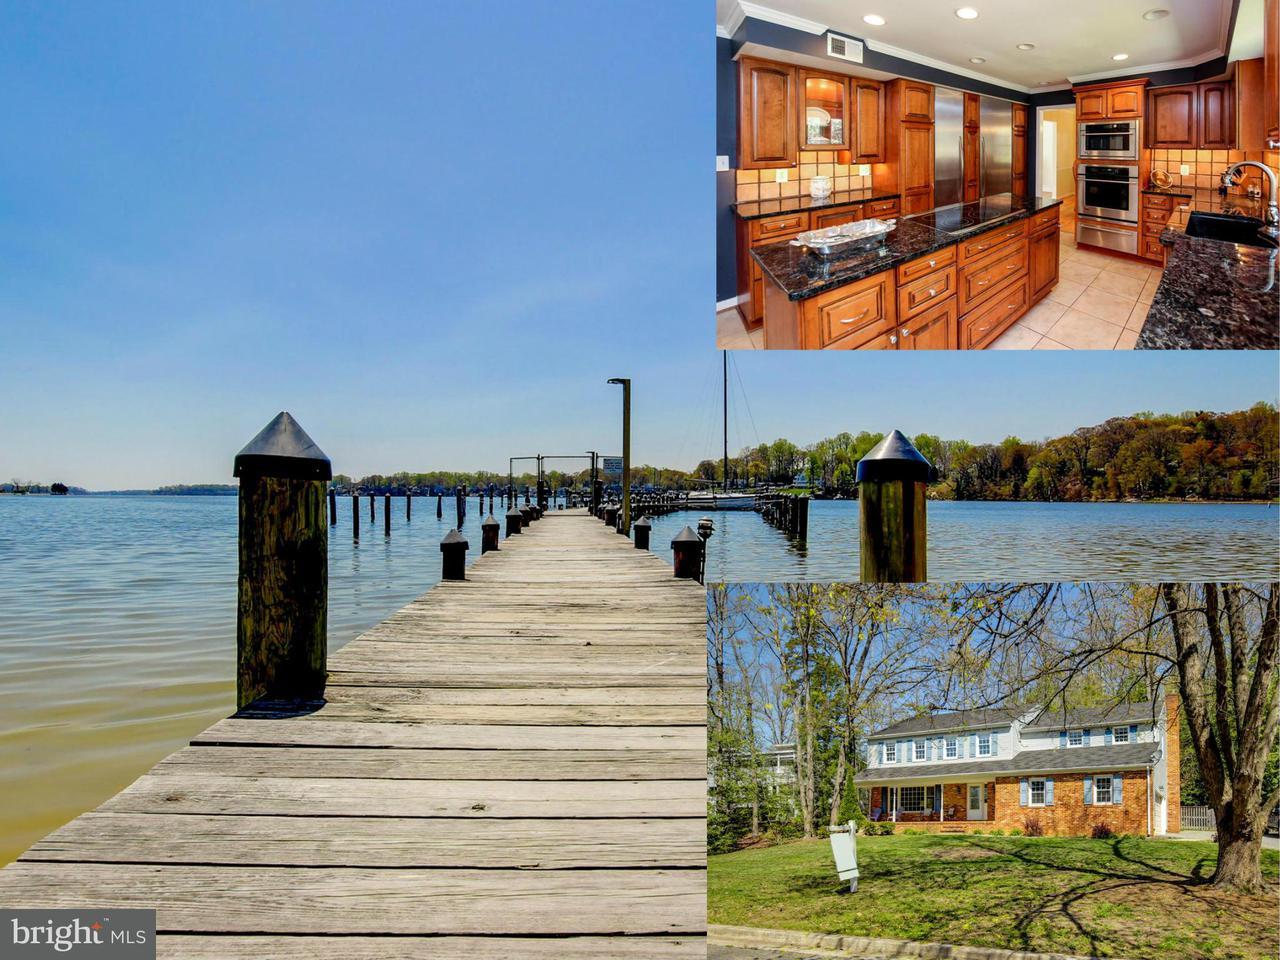 Single Family Home for Sale at 496 Lymington Road 496 Lymington Road Severna Park, Maryland 21146 United States